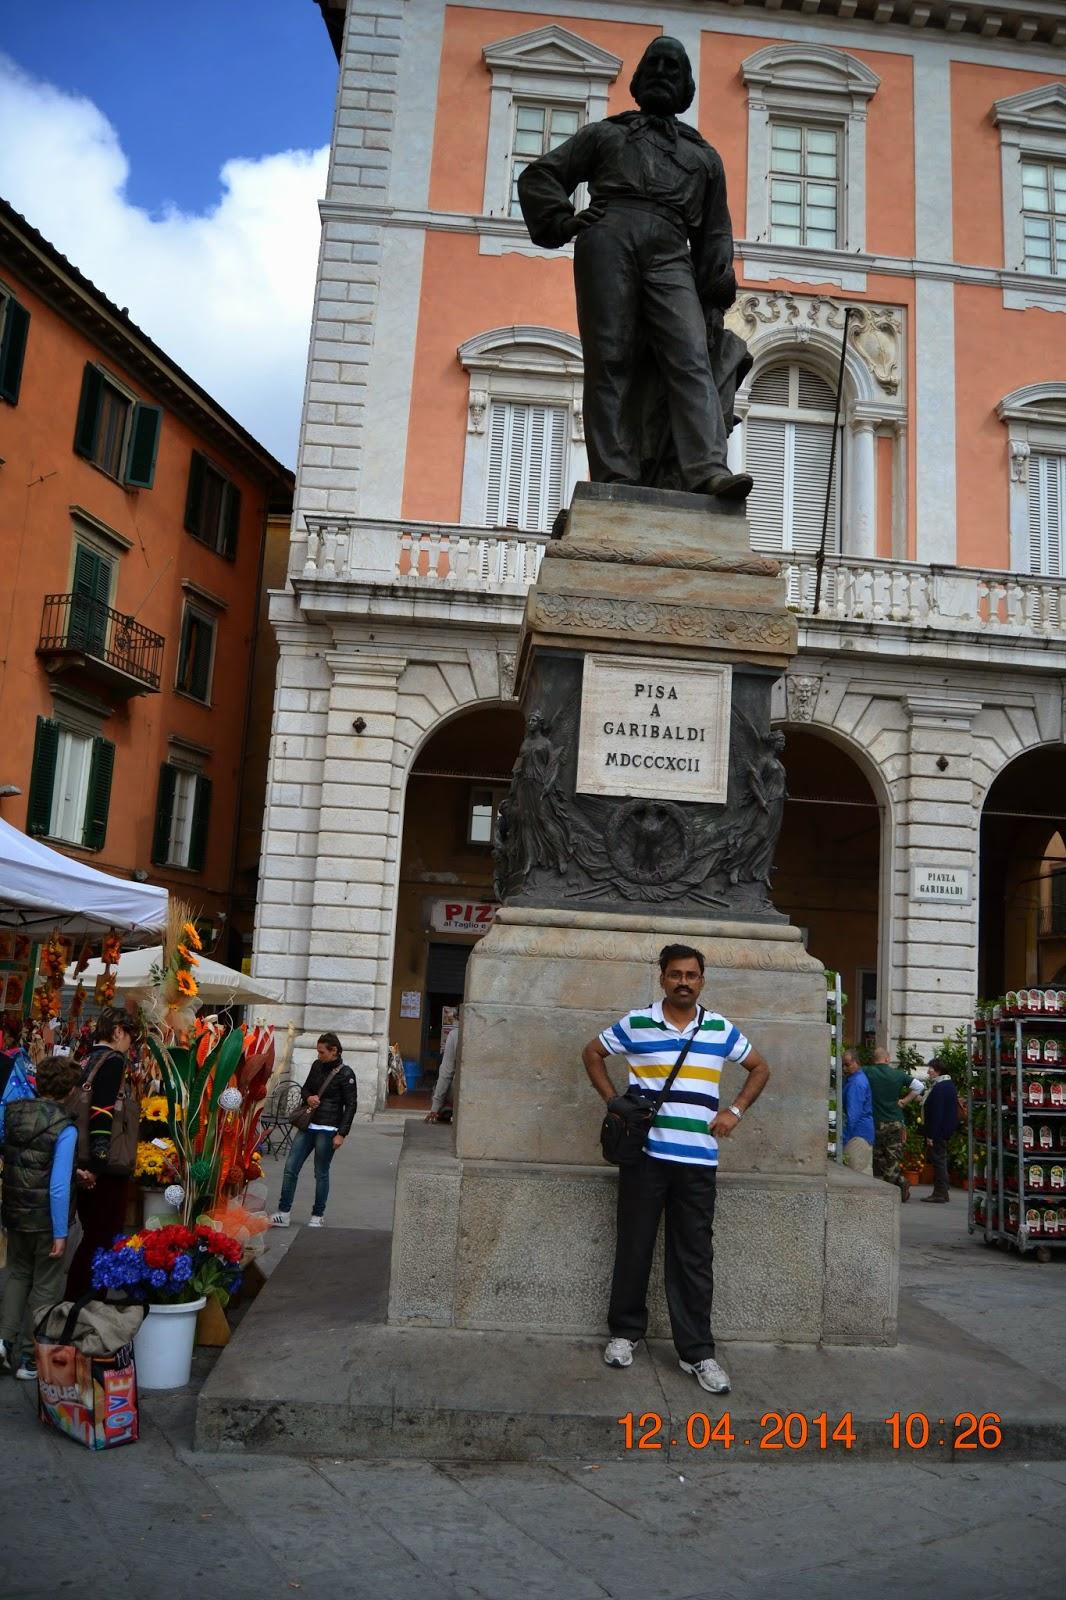 Garibaldi @ Pisa